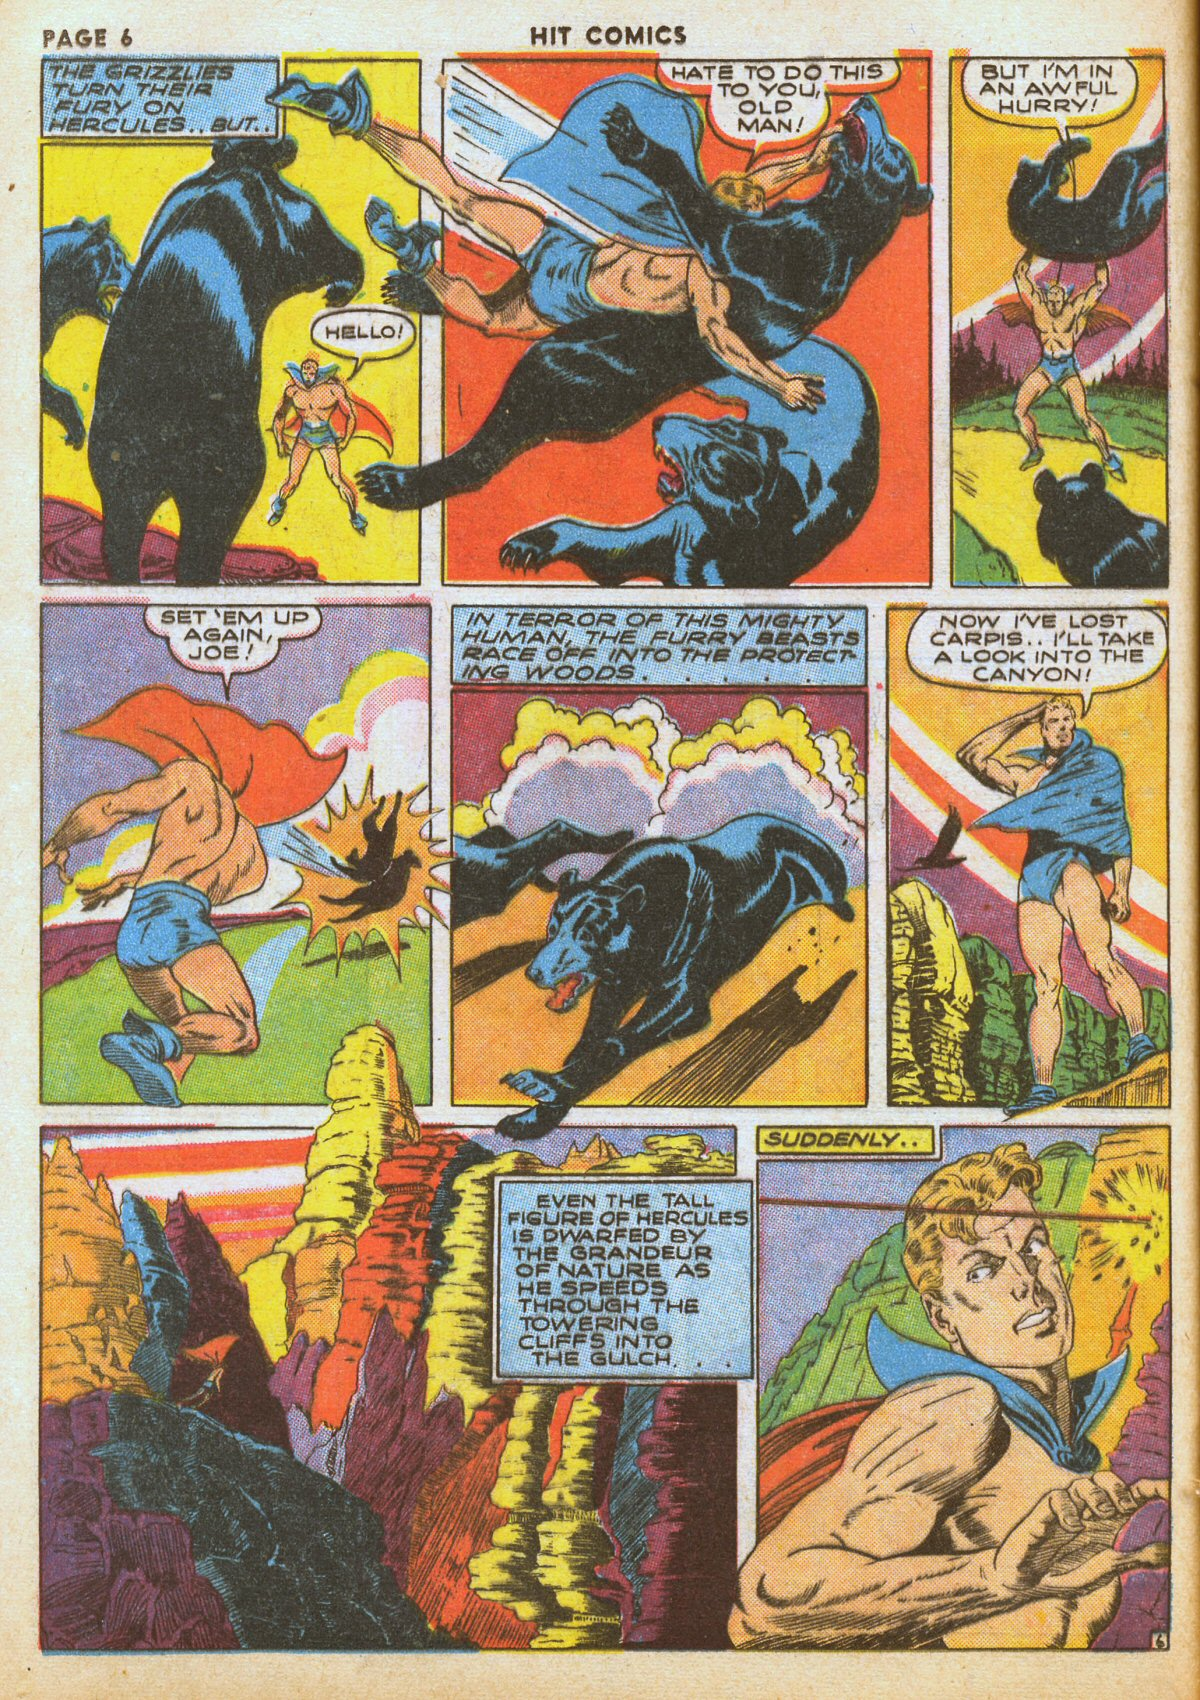 Read online Hit Comics comic -  Issue #12 - 8